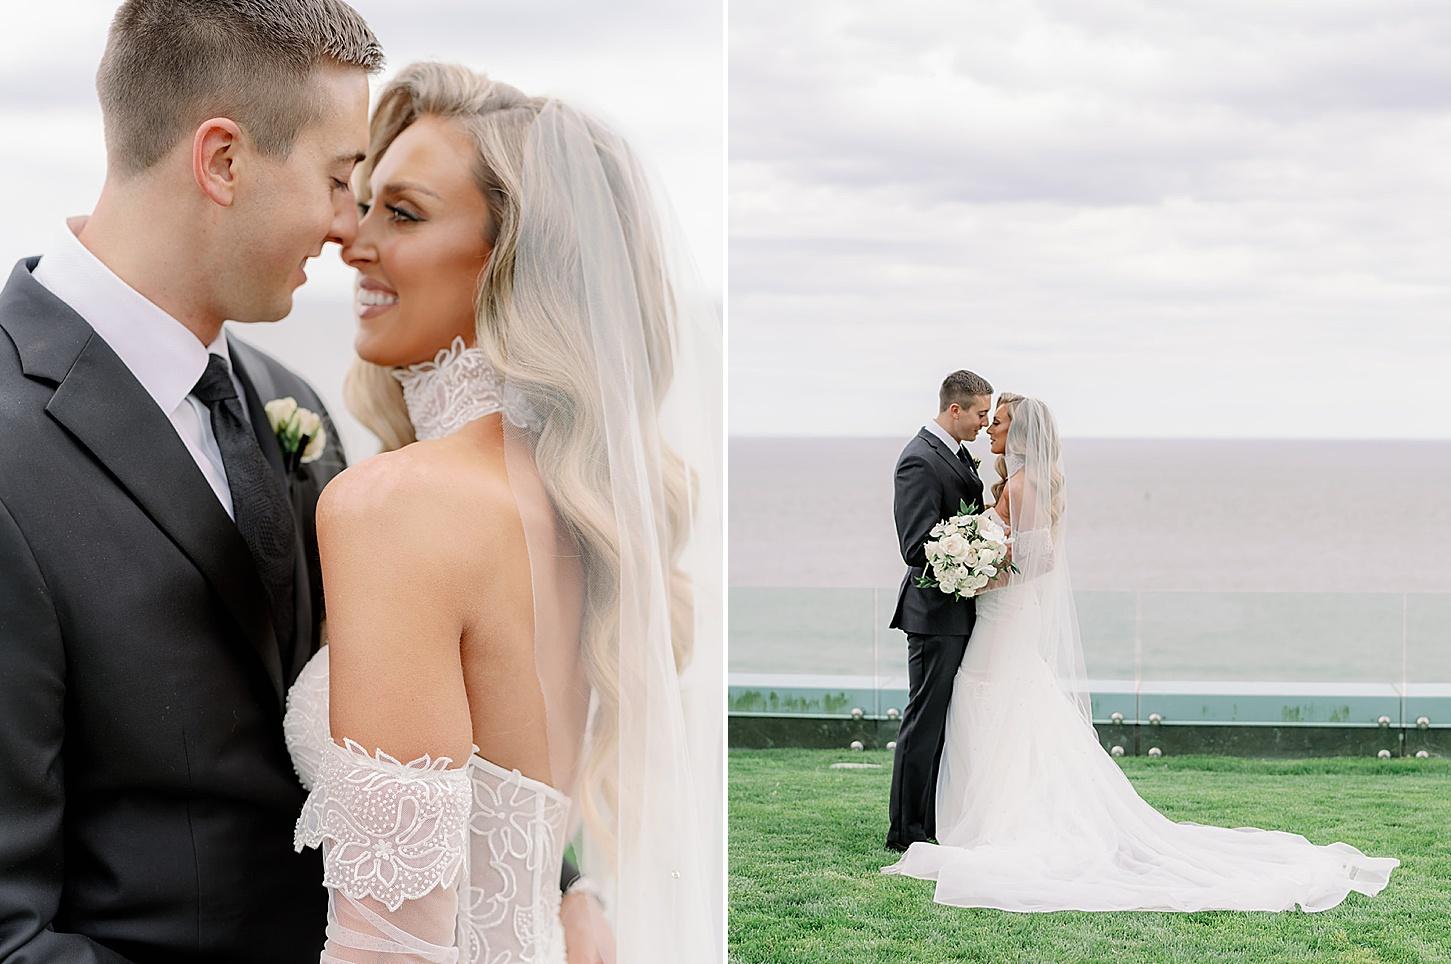 Atlantic City Wedding Photography Studio by Magdalena Studios Lexy Cha 0046